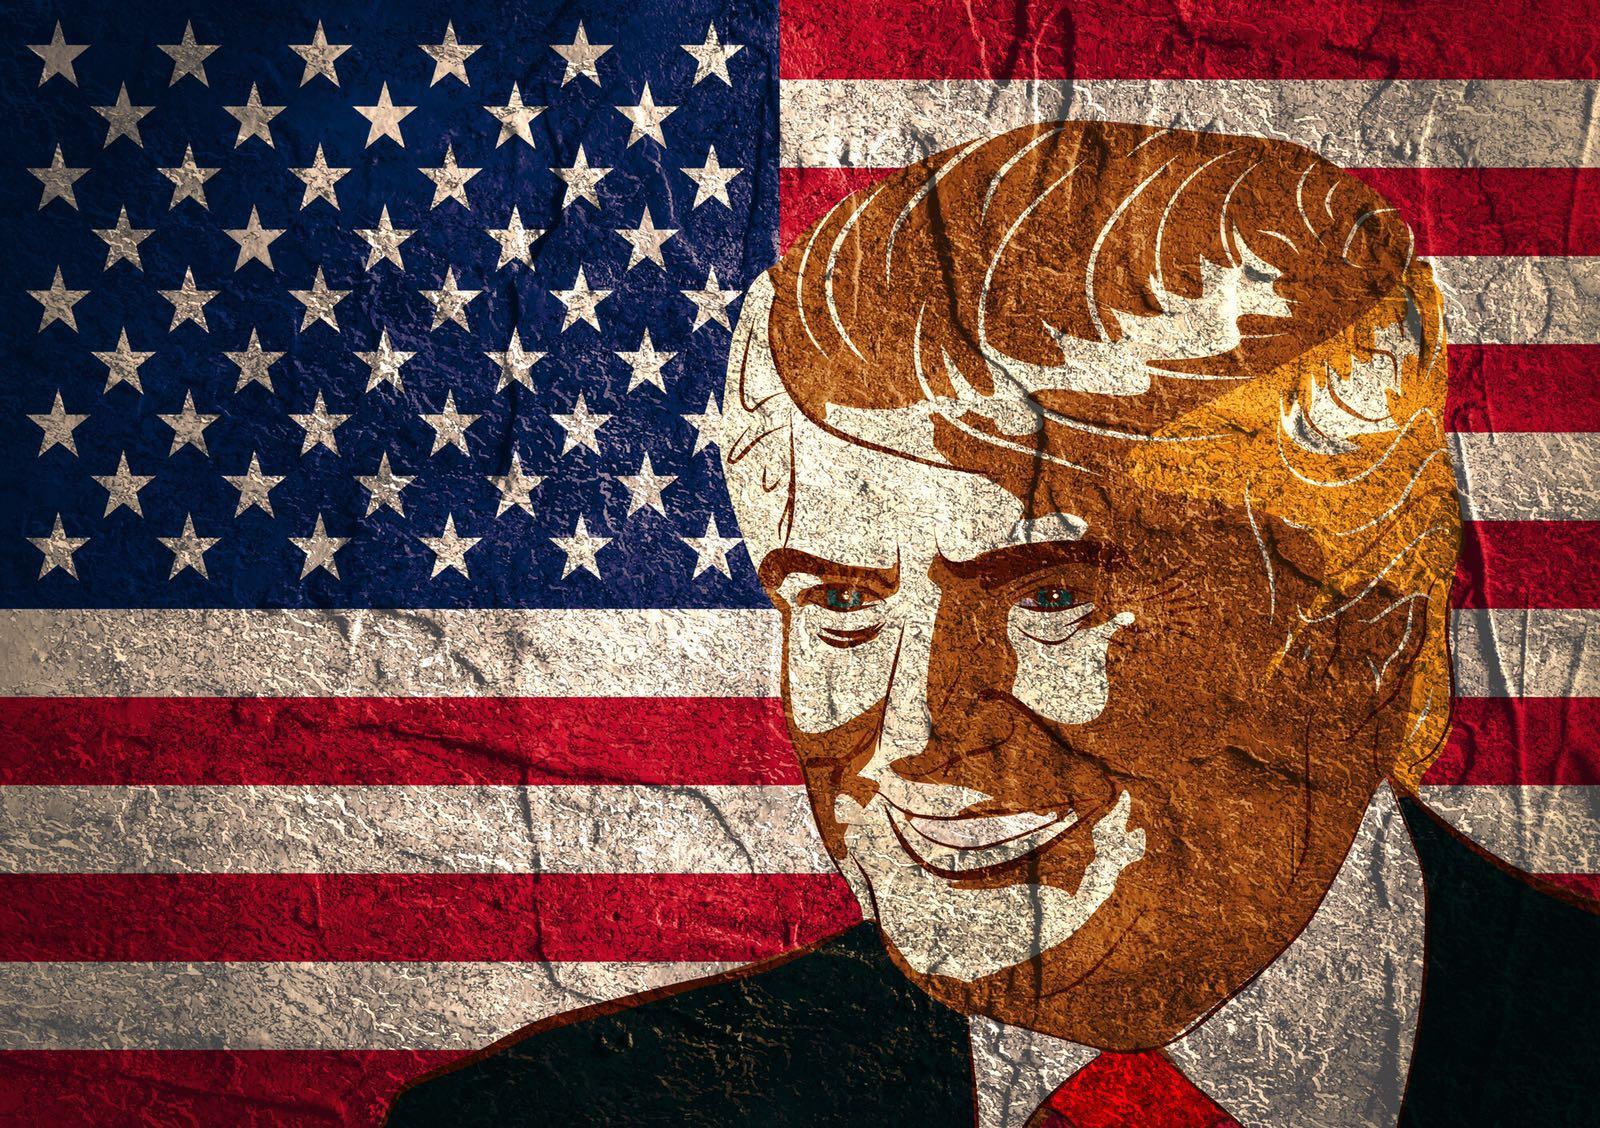 image asset - Let's make America great again!